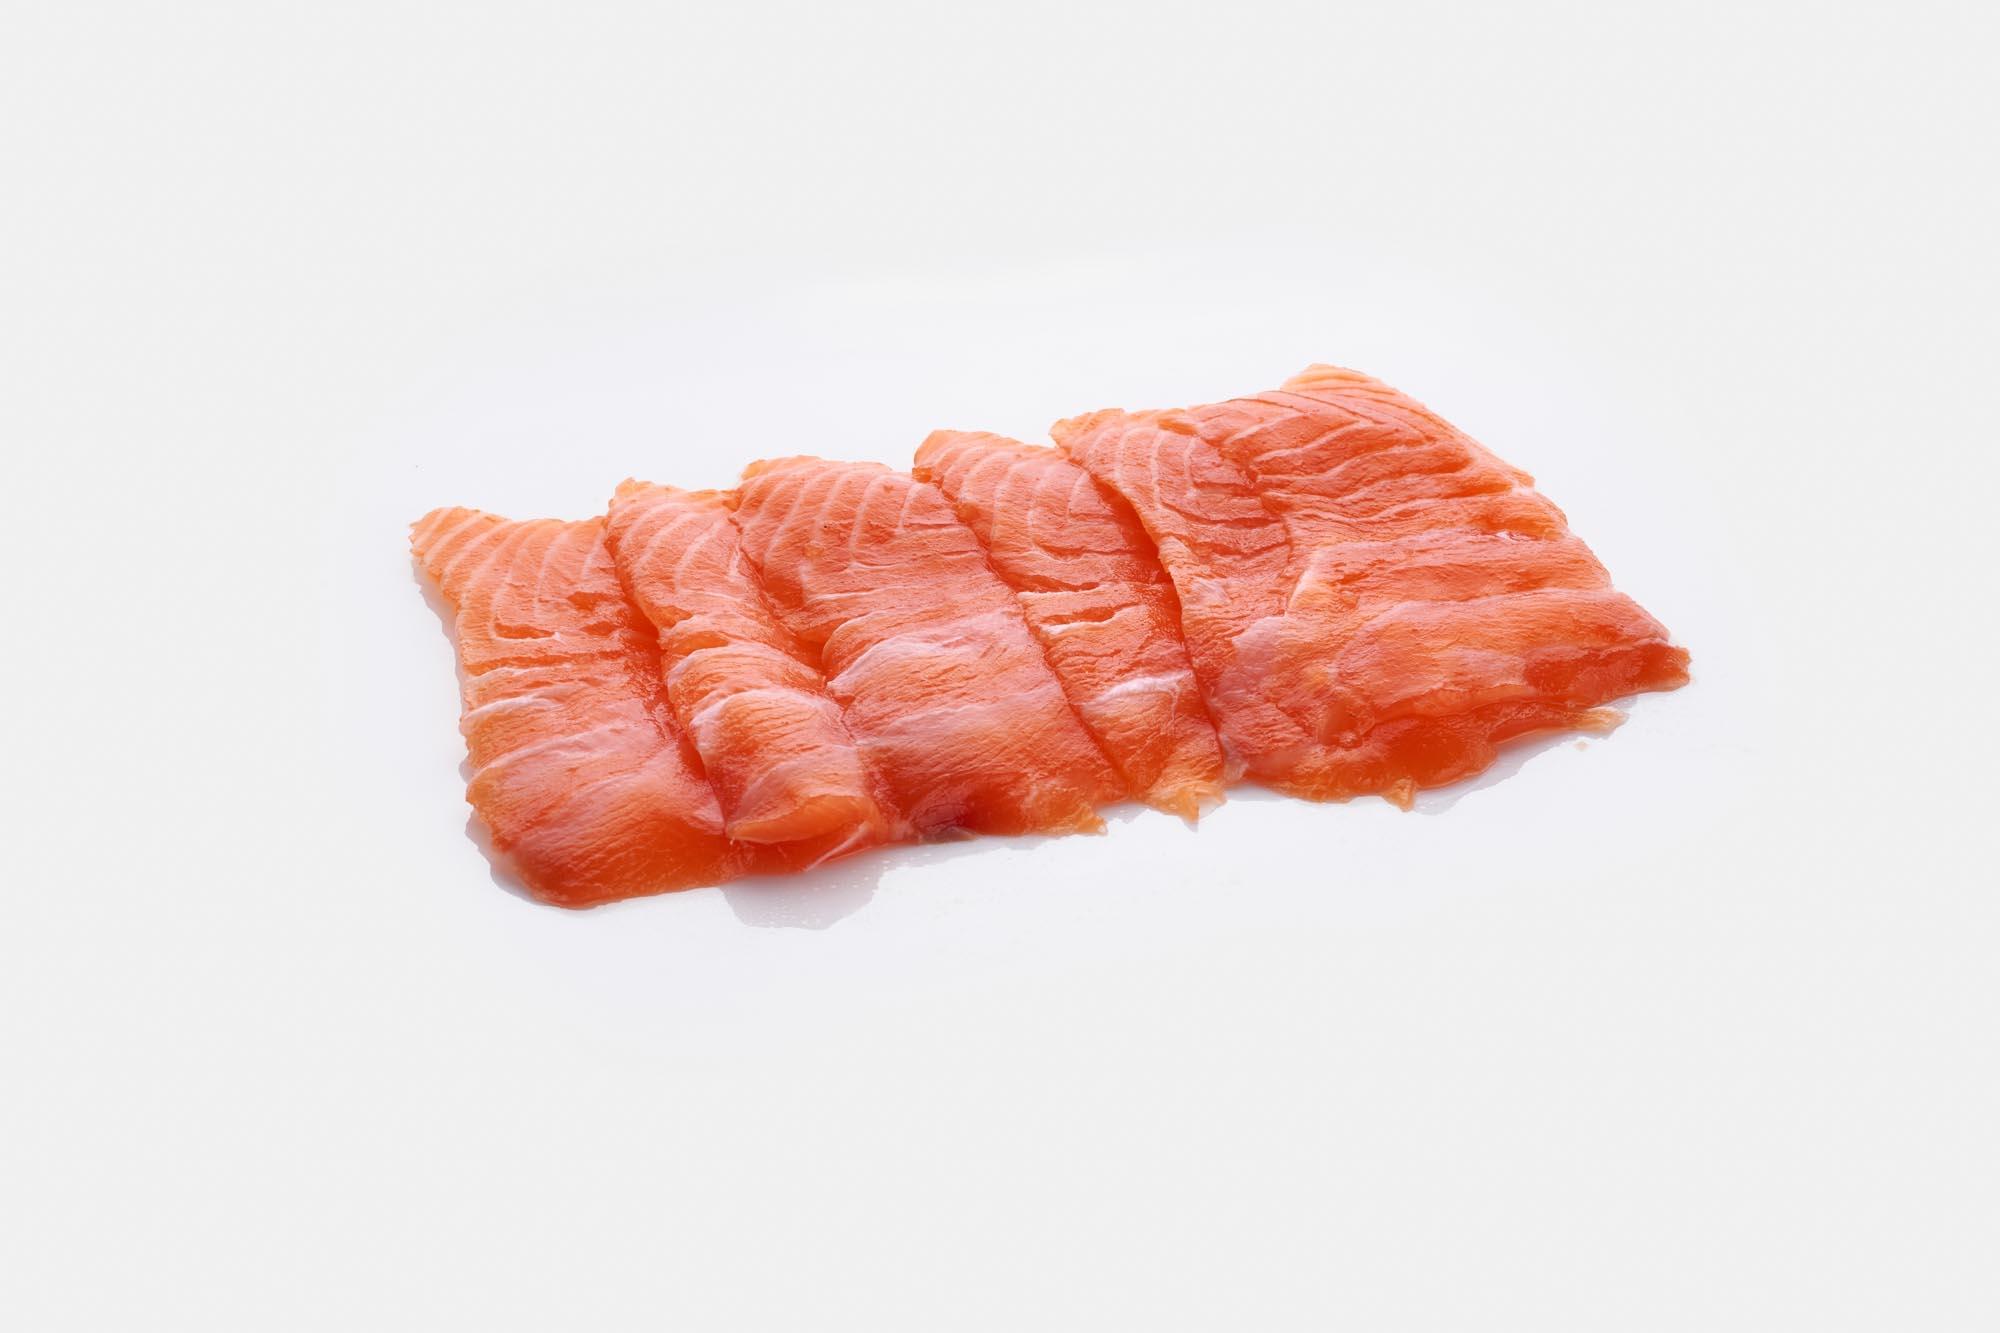 how to prepare salmon sashimi at home